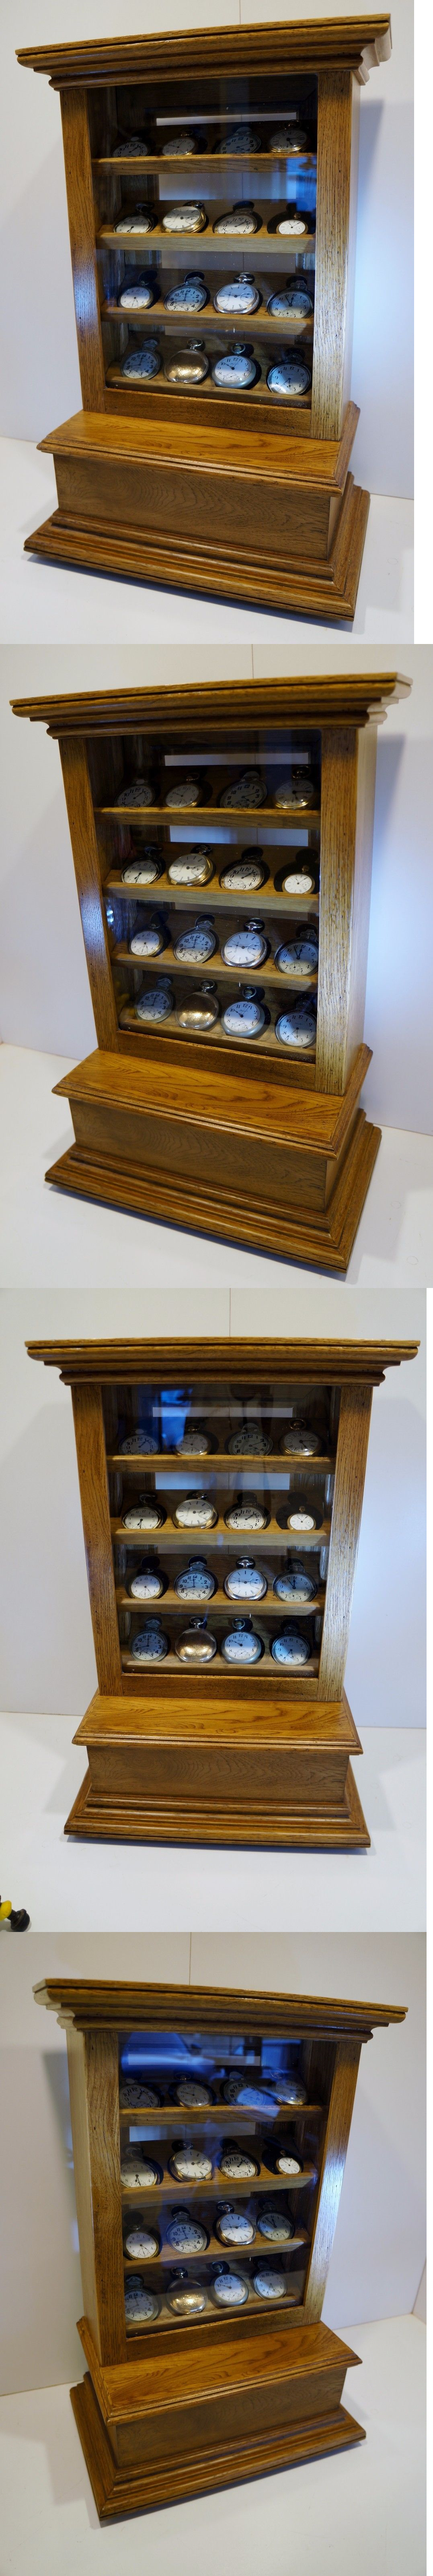 Antique 3940 Counter Top Pocket Watch Display Case Cabinet Displays